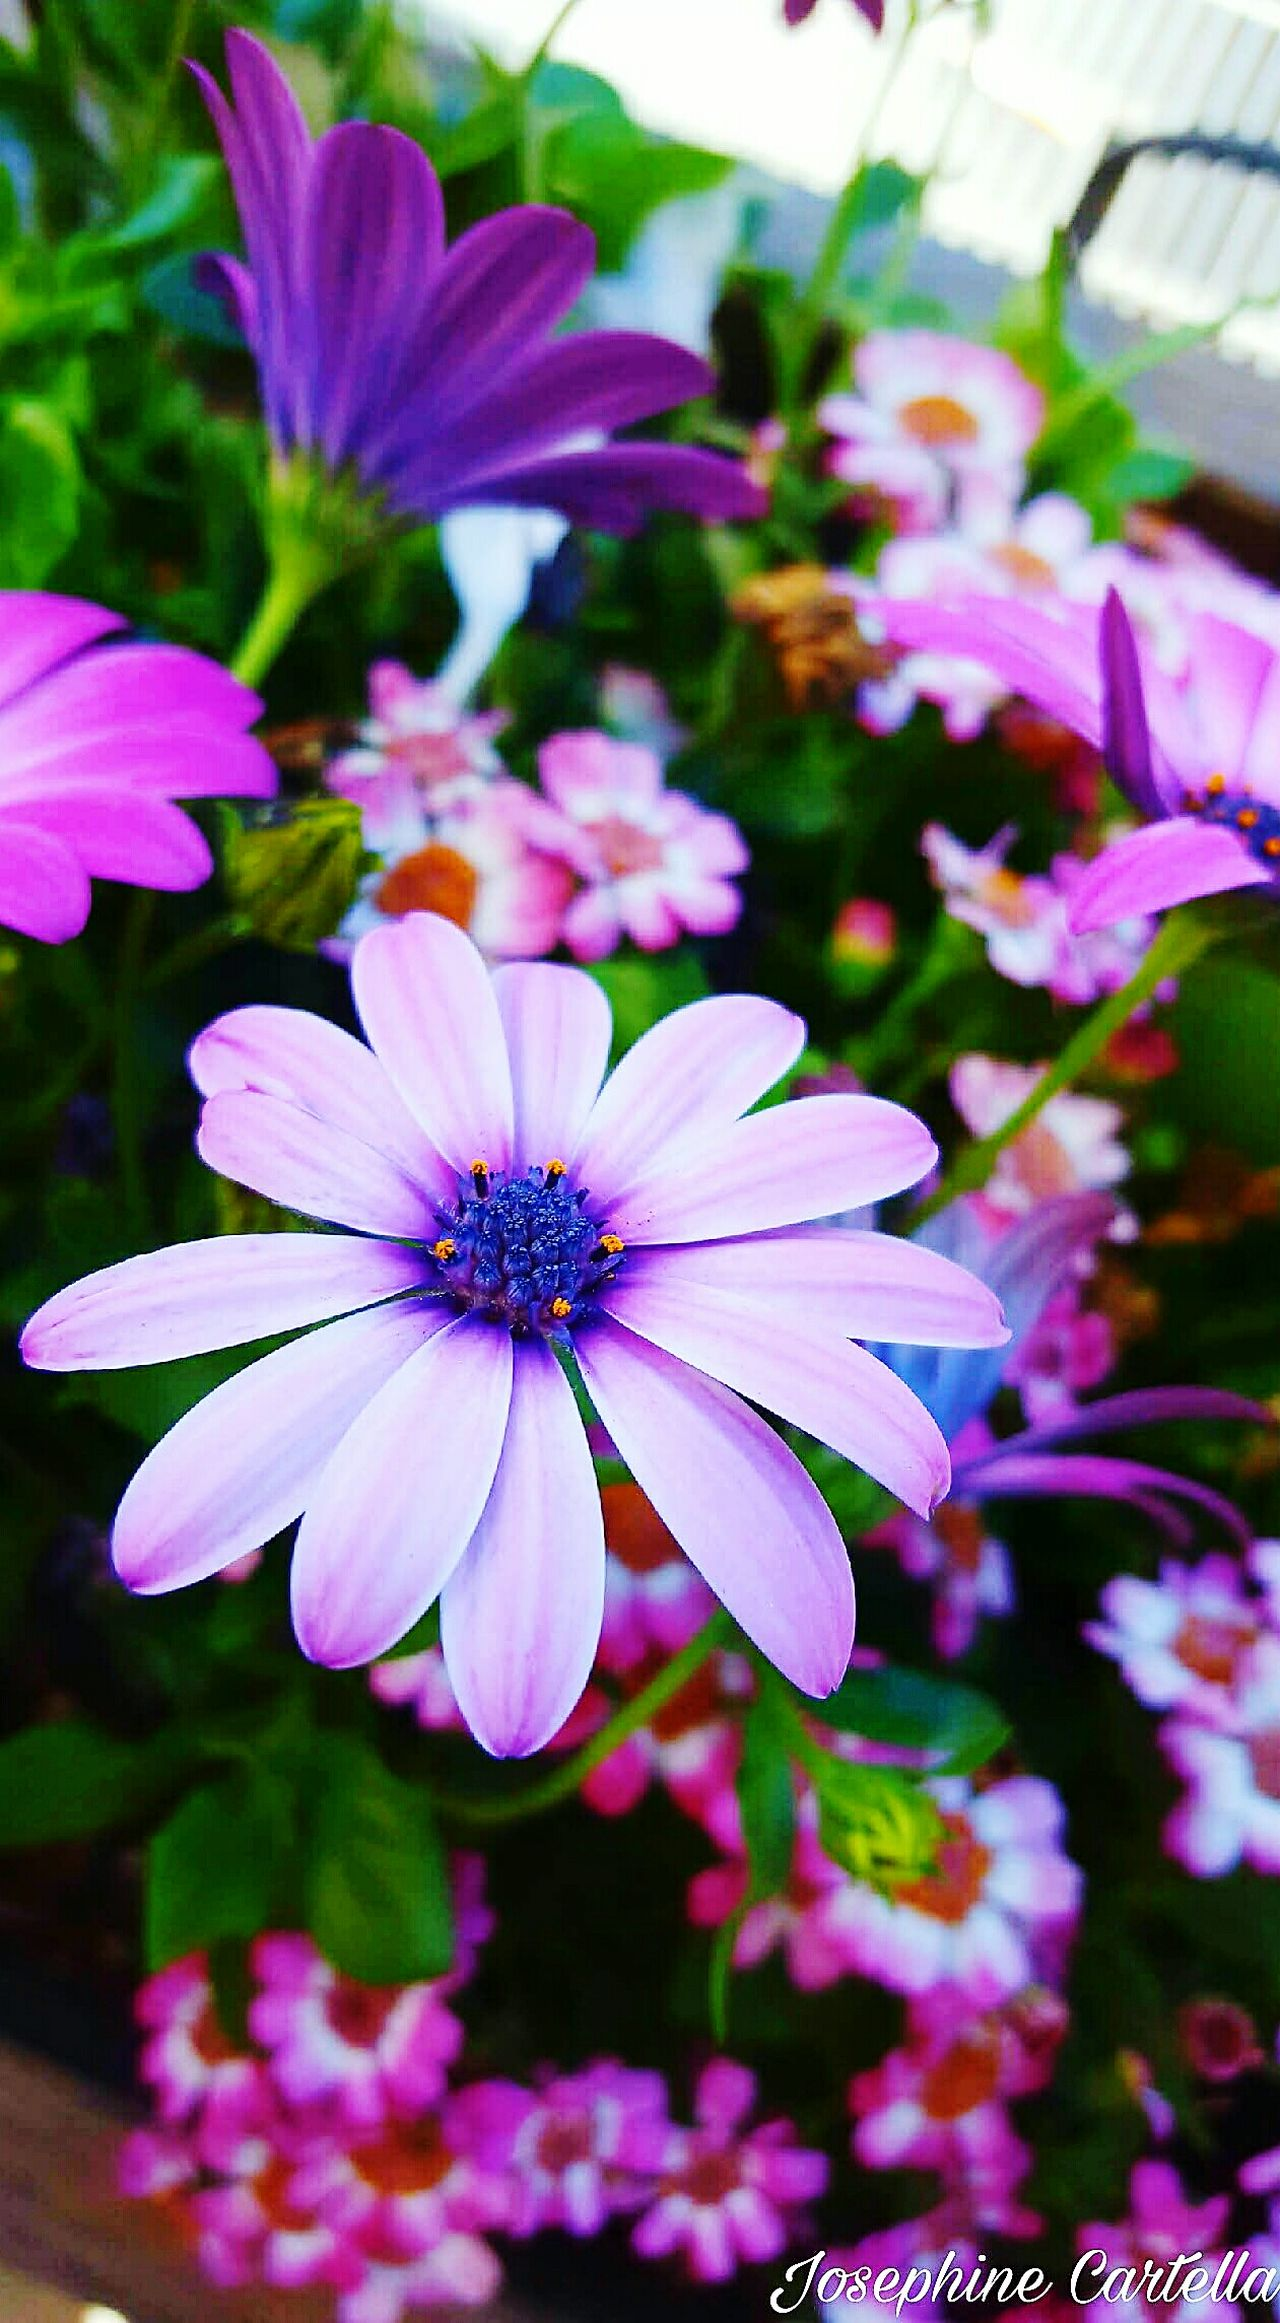 Flower Purple Pink Color Plant Fragility Nature Day Beauty In Nature Fiori Fioriprimaverili Fioridagiardino Fiori Colorati.. Fiorispontanei Fiori!!! Fioribelli Fiori Colori Colors Colour Of Life Colorsplash Colors Of Nature Color Of Life Colori Colorphotography Photography Freshness First Eyeem Photo